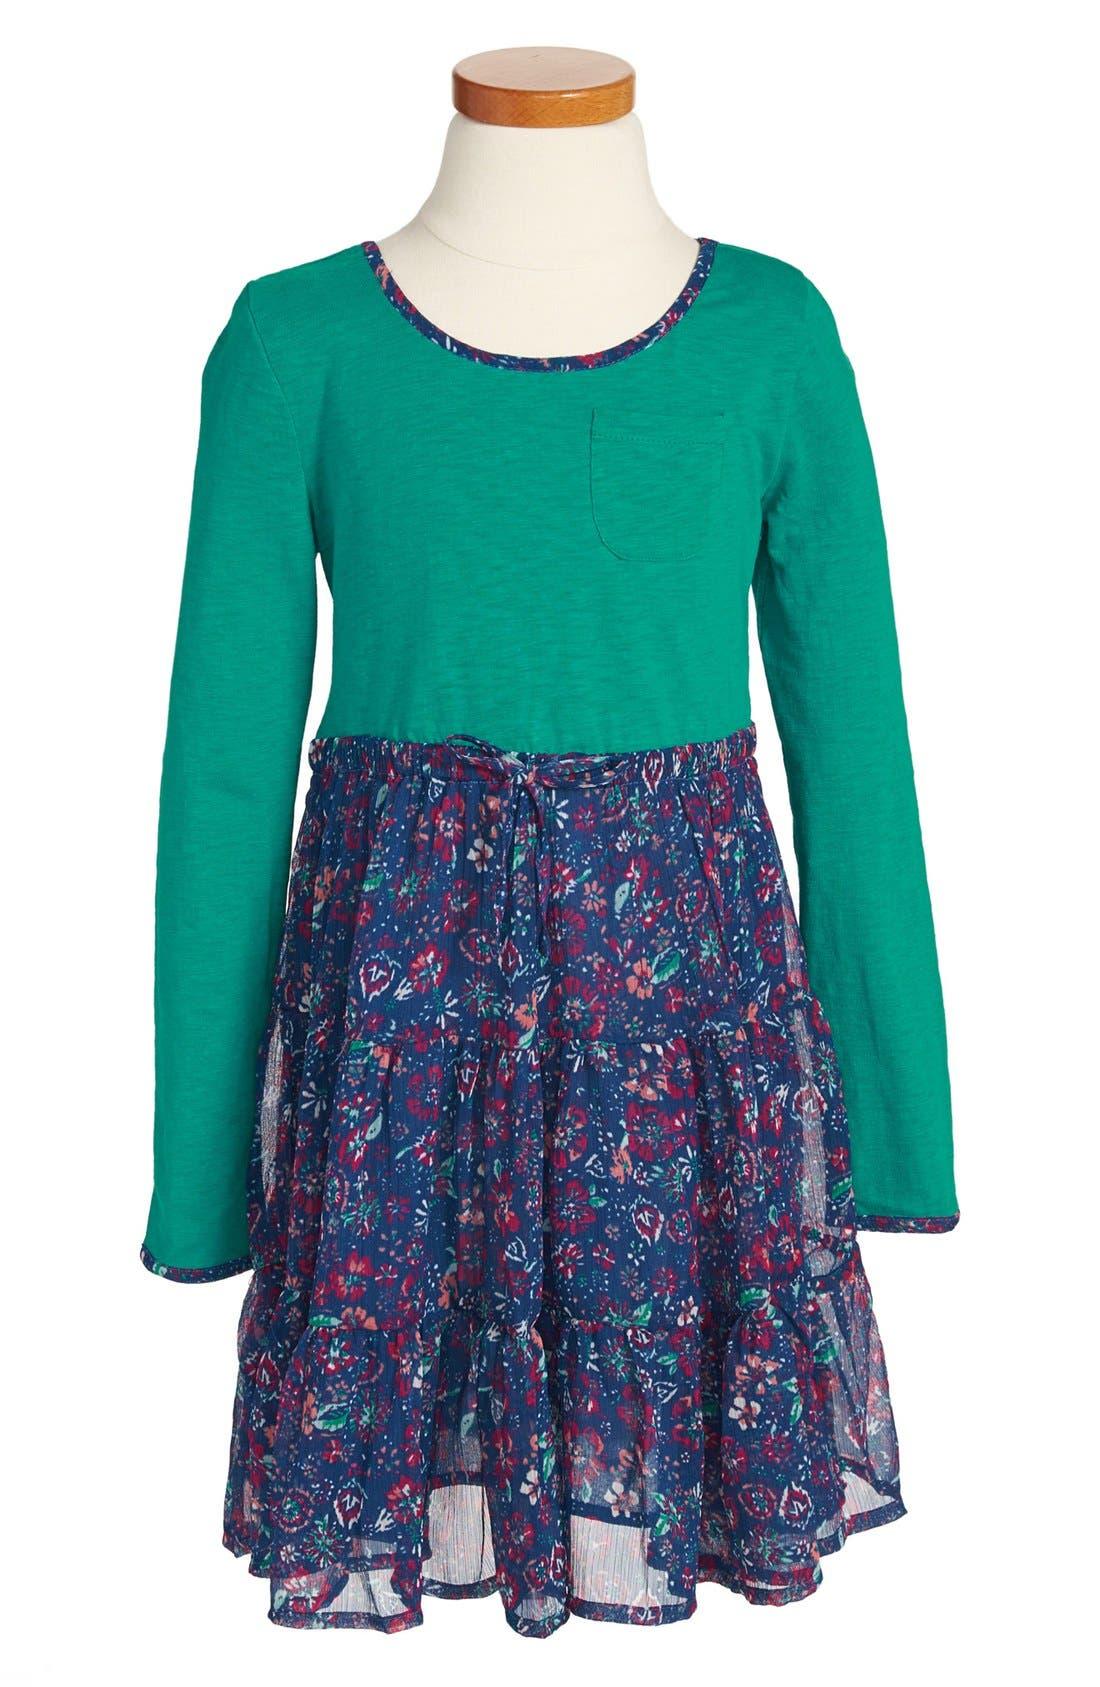 Main Image - Roxy 'Sandy Footprints' Dress (Toddler Girls)